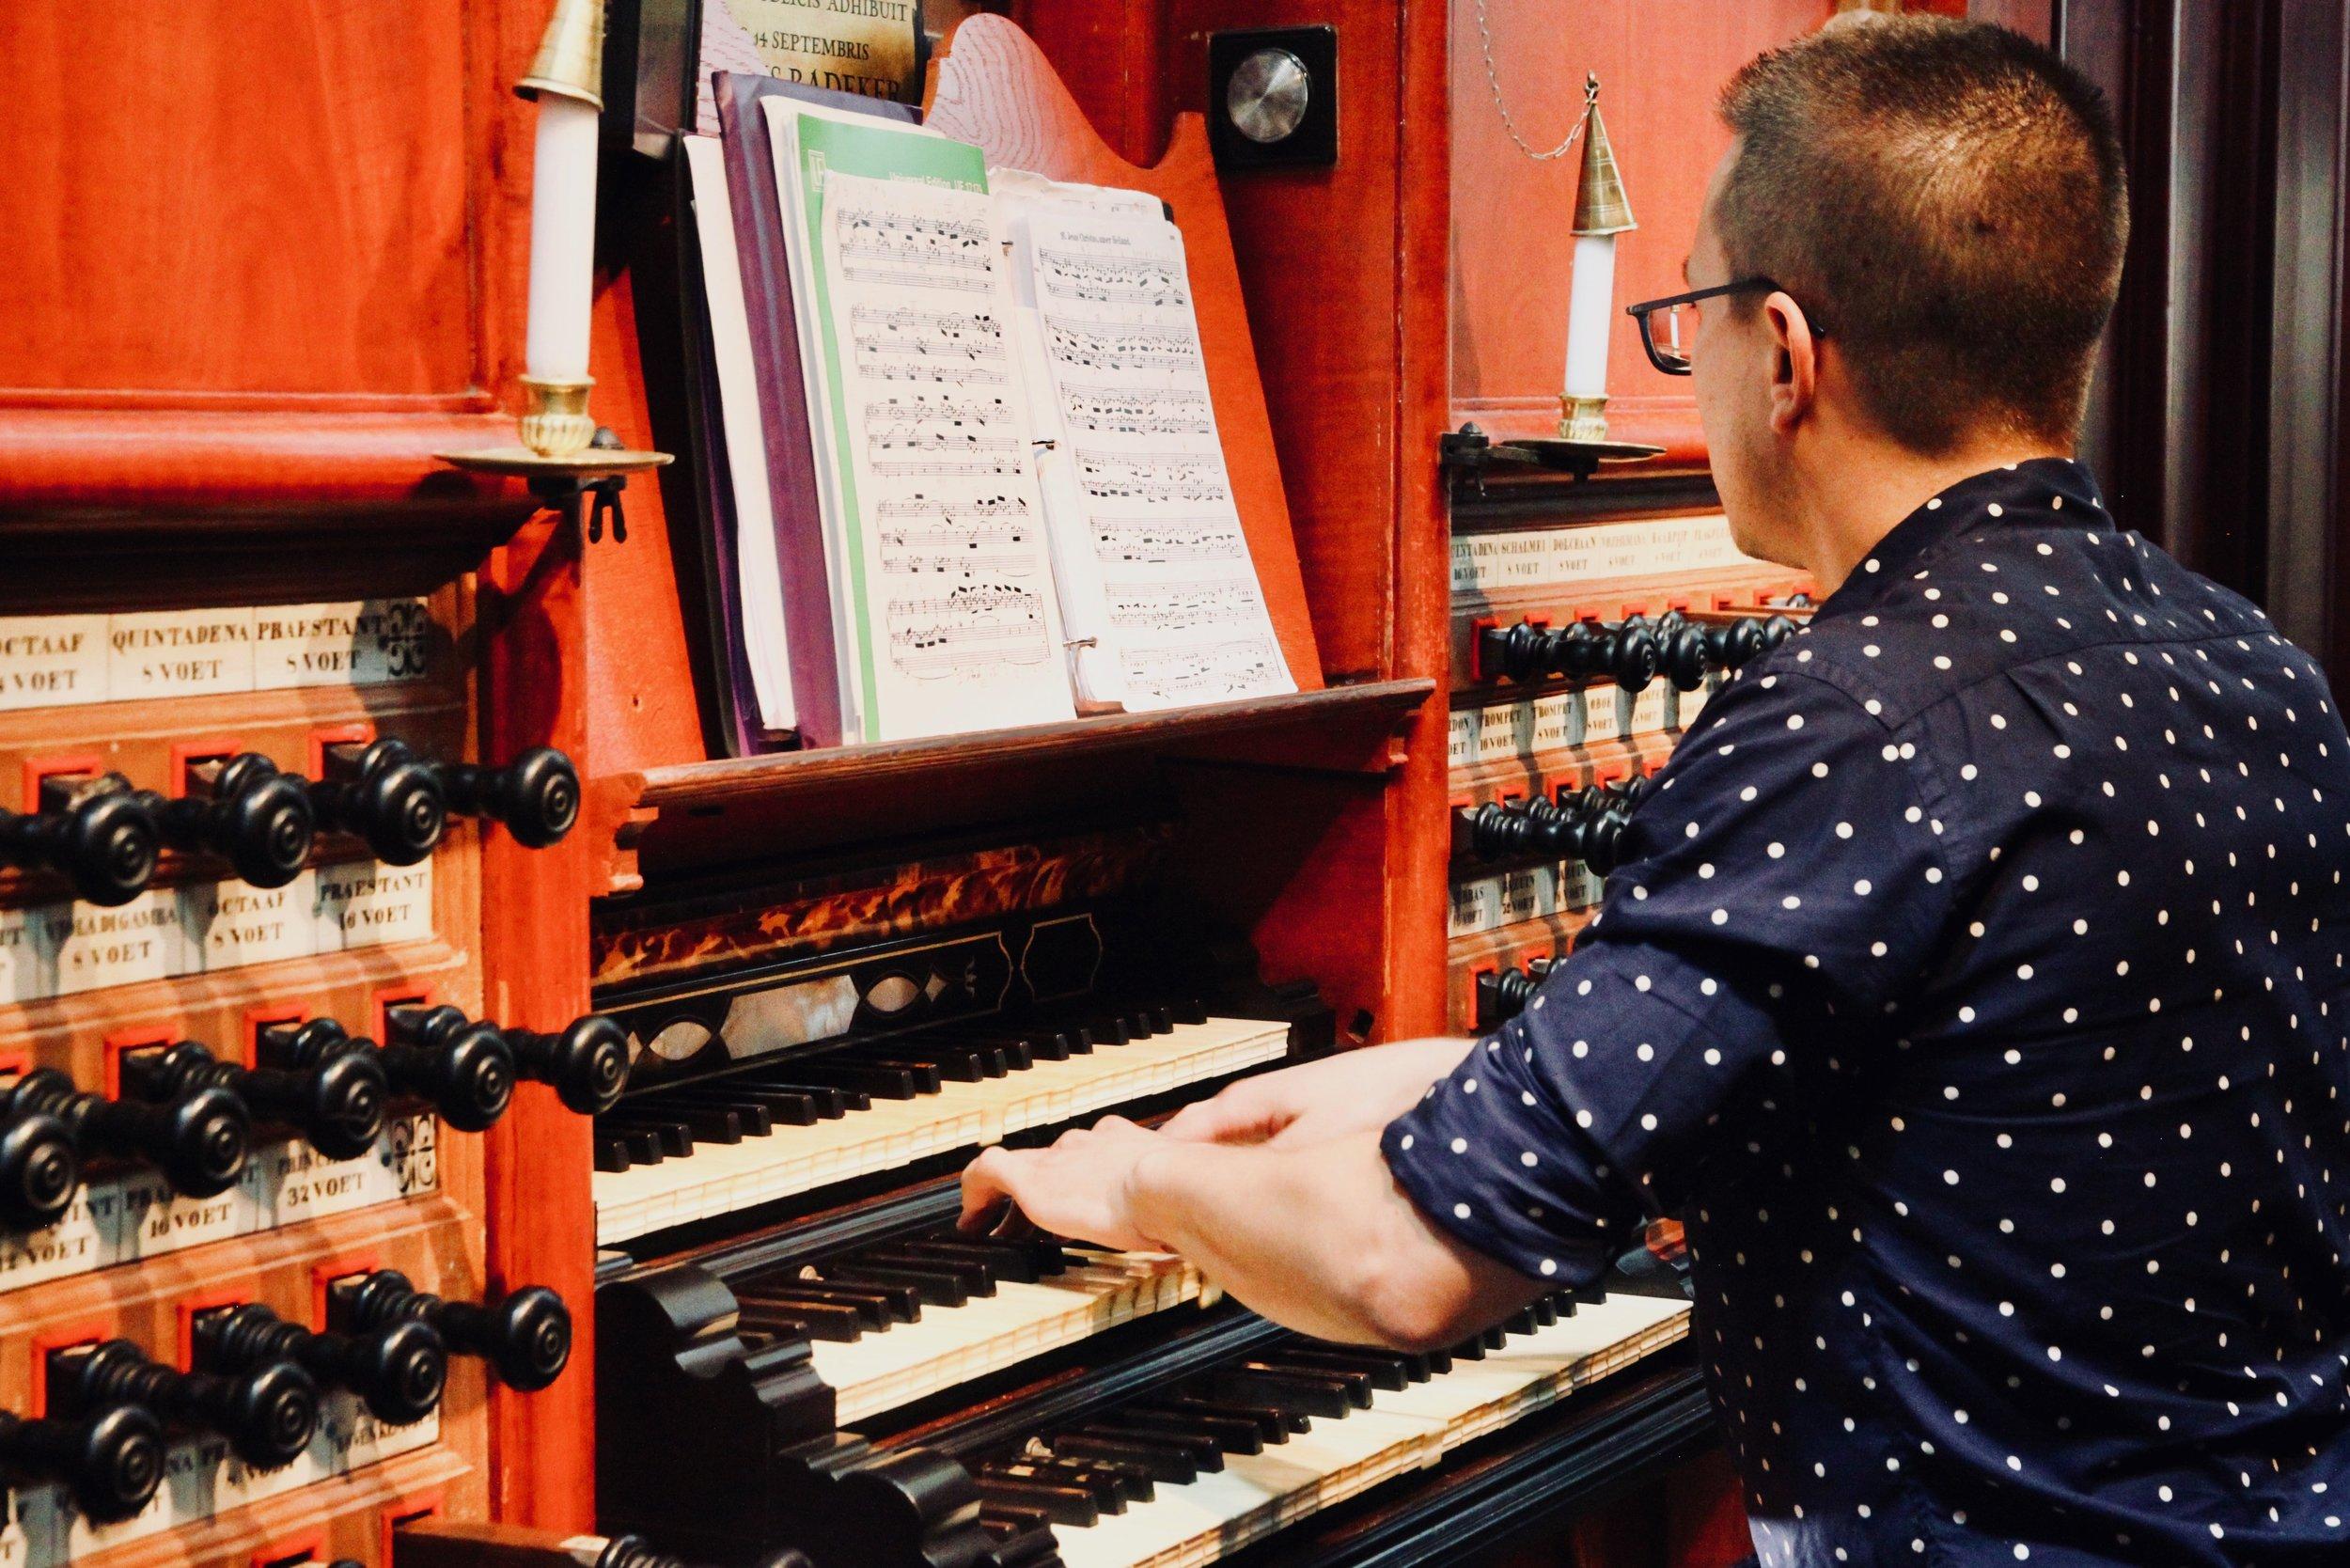 Corey De Tar plays the Muller organ in St-Bavo, Haarlem. Boston Organ Studio.